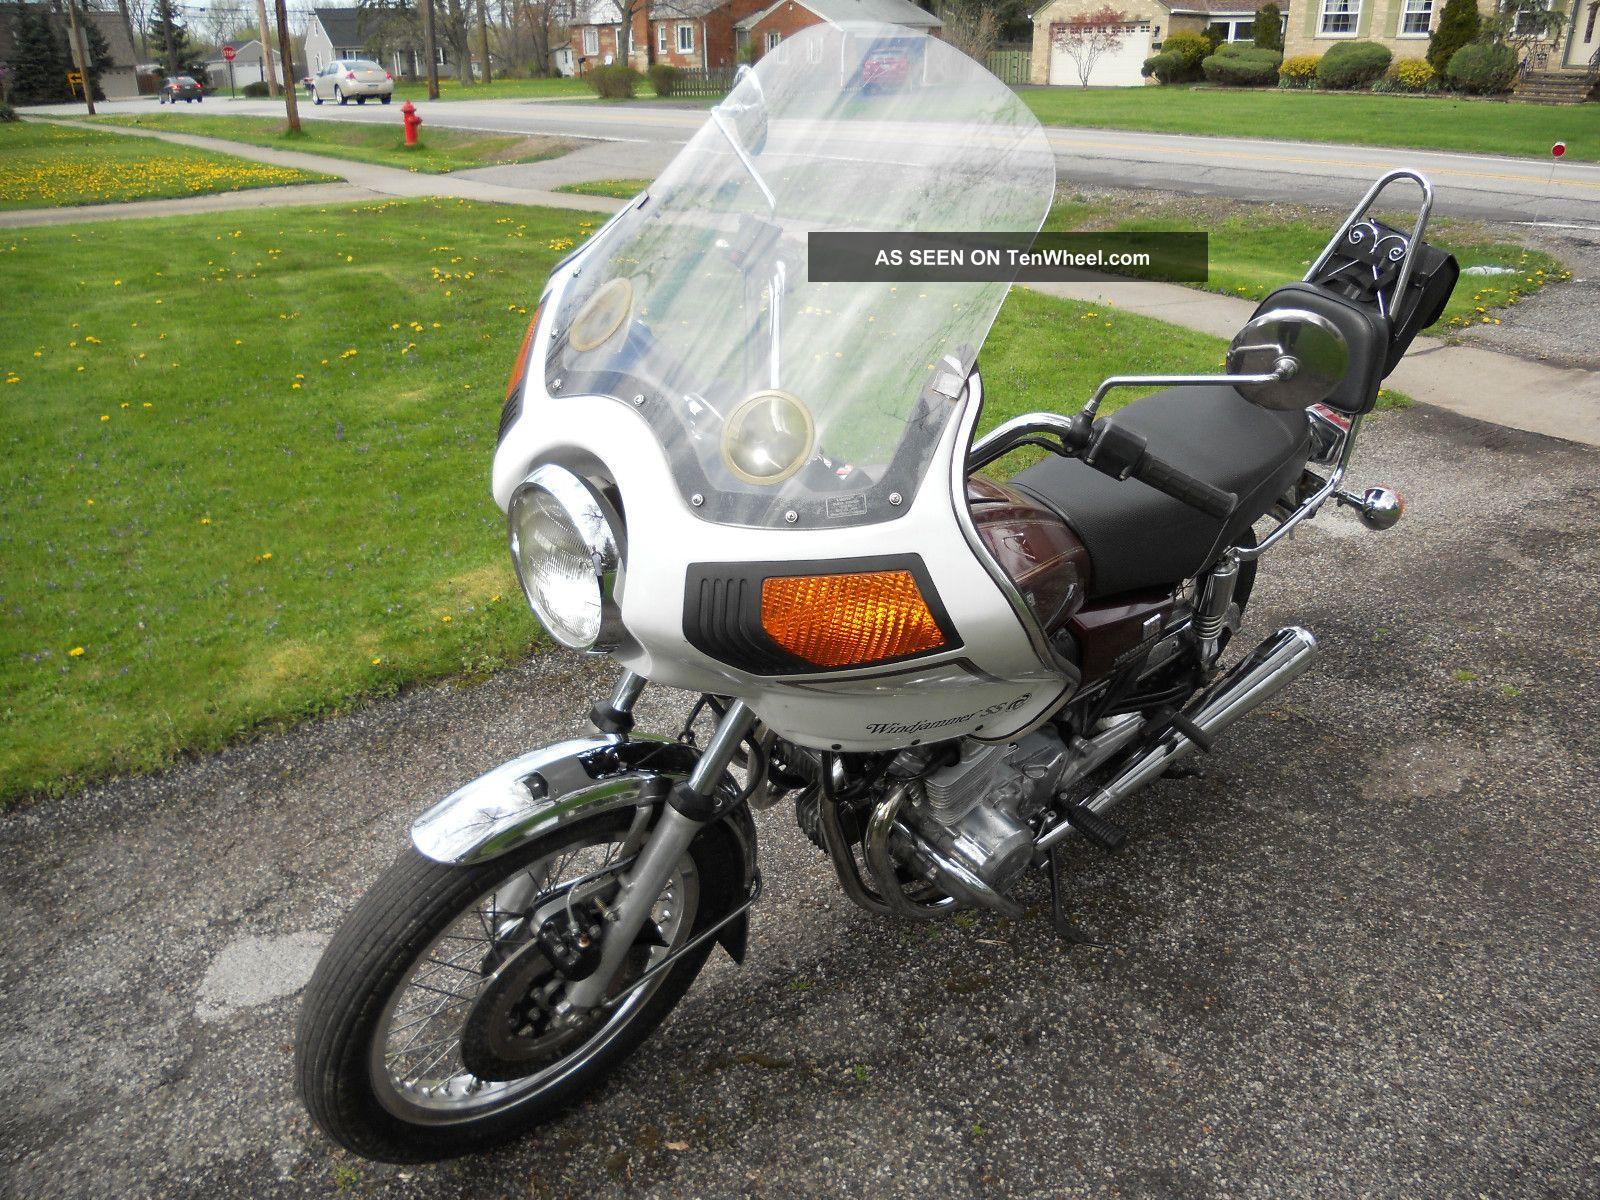 1977 Honda Cb750a Hondamatic, Automatic Transmission